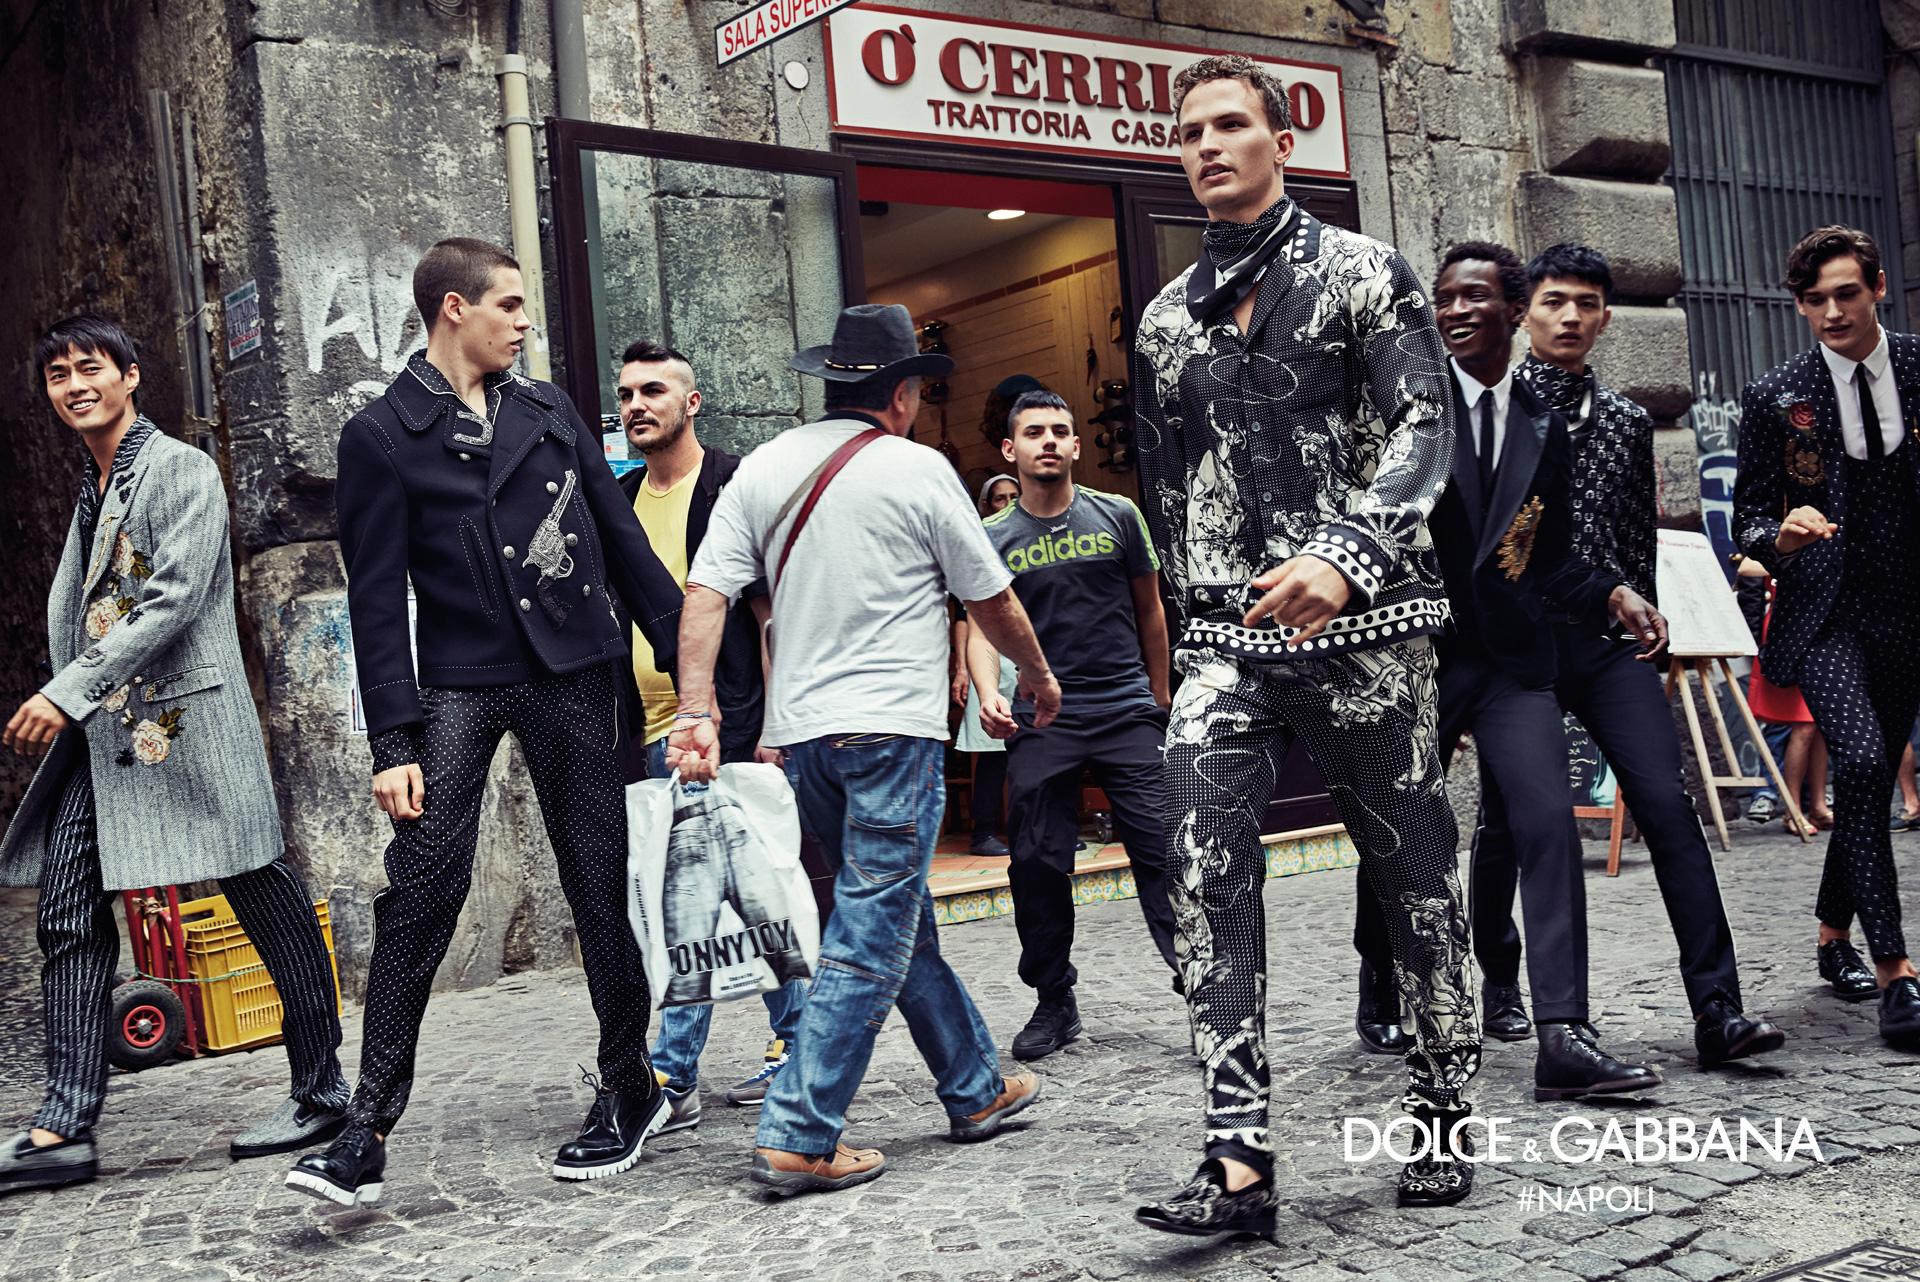 Dolce-Gabbana-Fall-Winter-2016-2017-Ad-Campaign-Naples-3